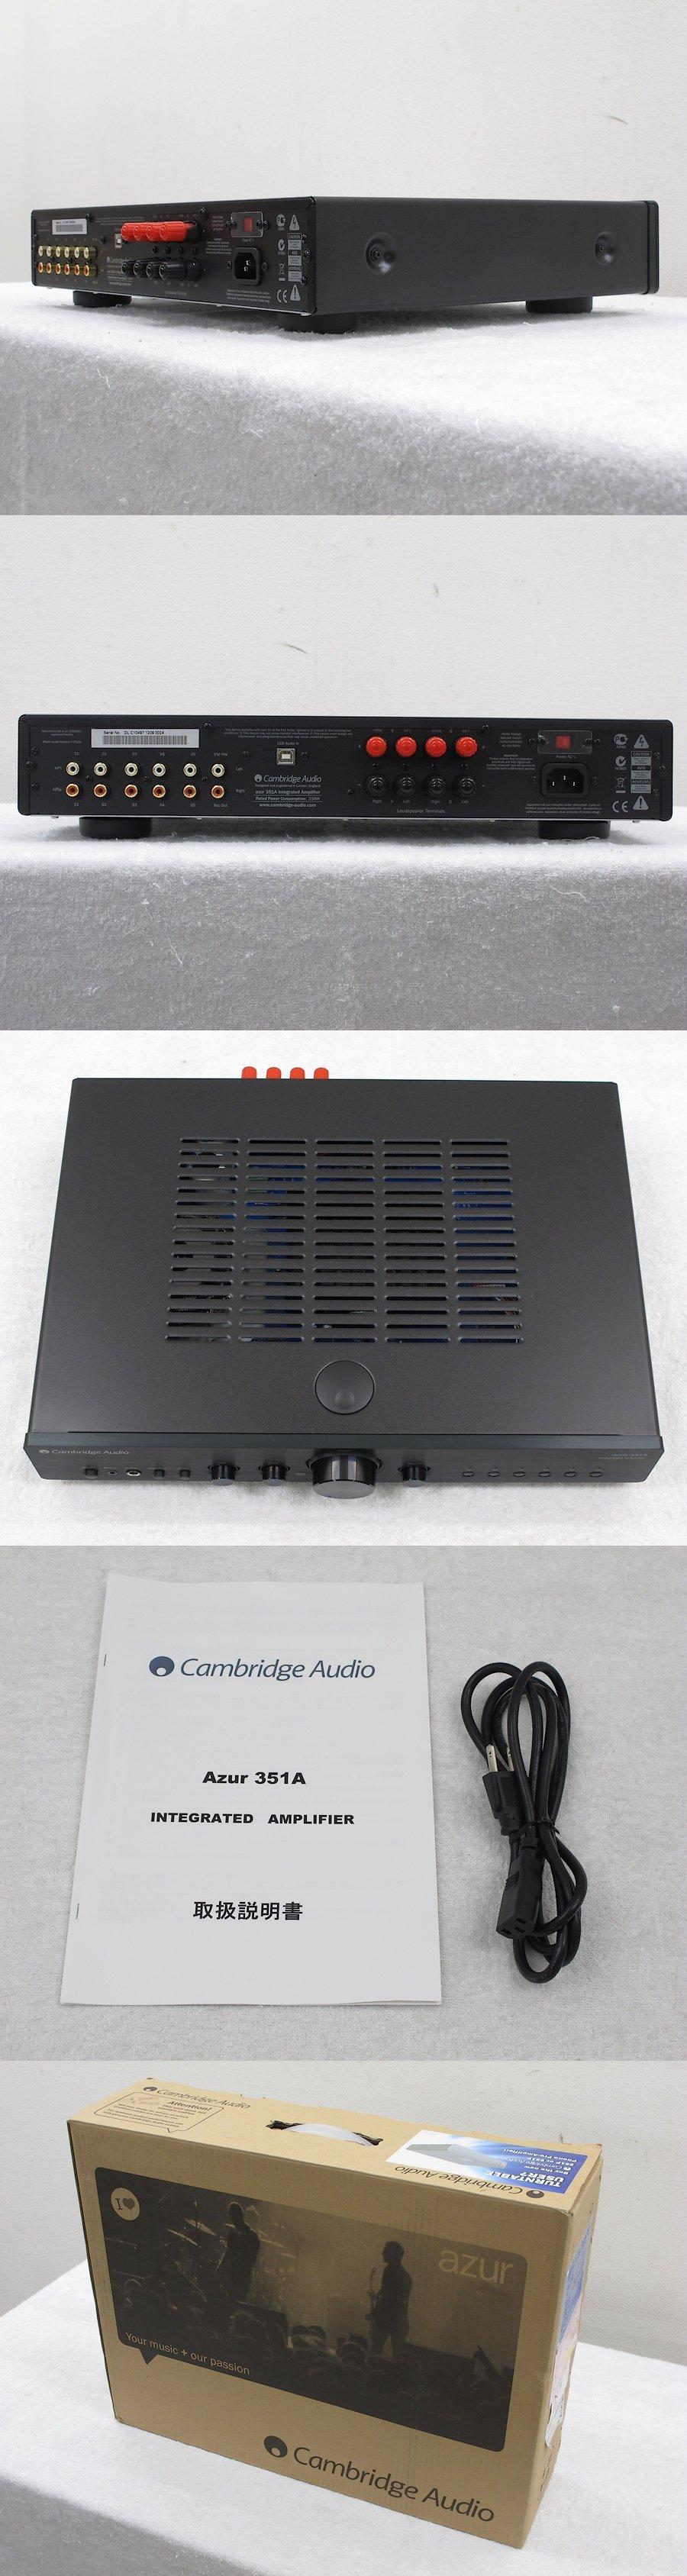 cambridge audio azur 351a manual